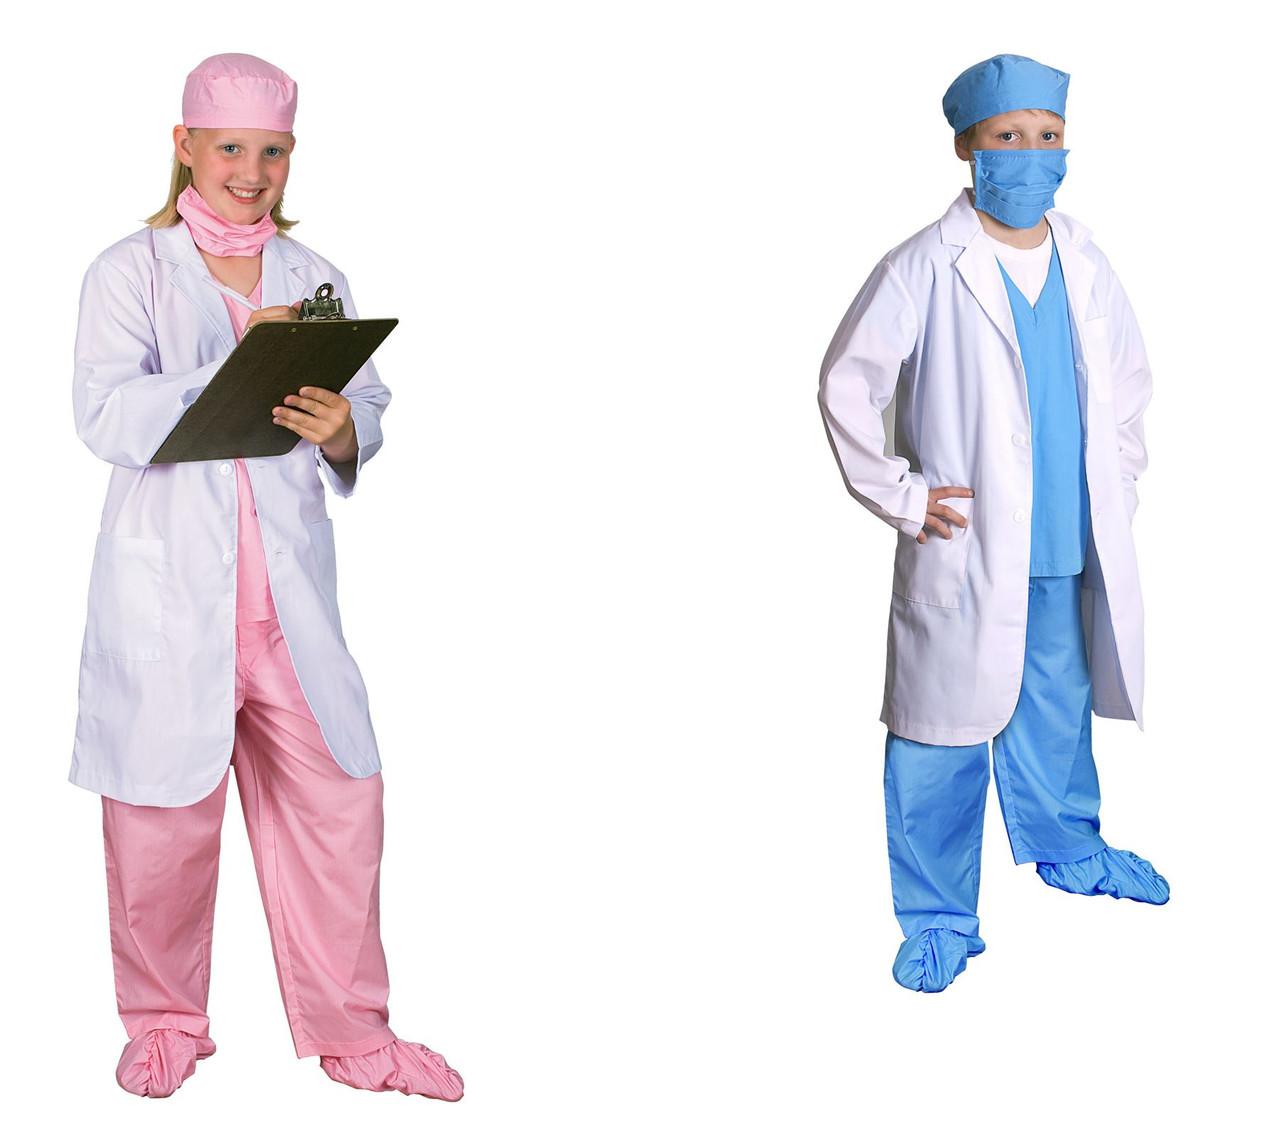 Jr Physician Coat Career Surgeon Doctor Boys Girls Halloween Costume